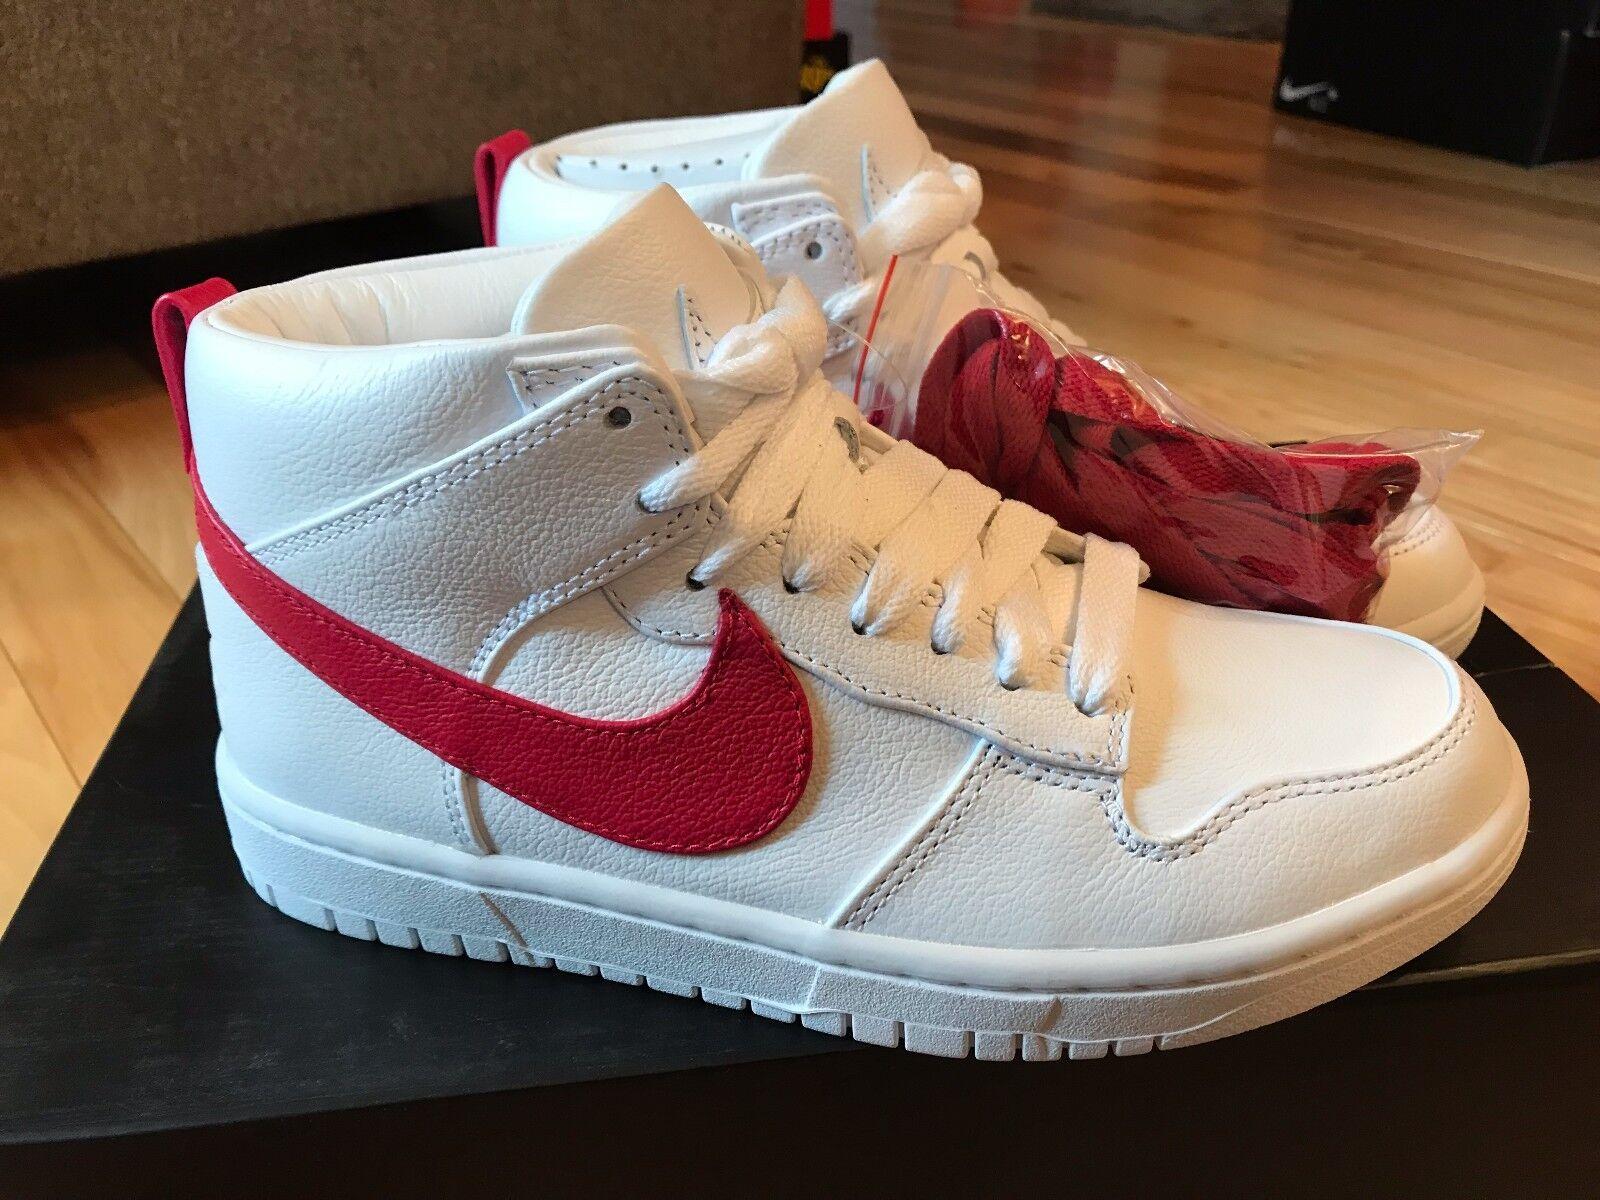 Great discount Nike NikeLab Dunk Lux Chukka RT Riccardo Tisci White Red 910088-100 Comfortable